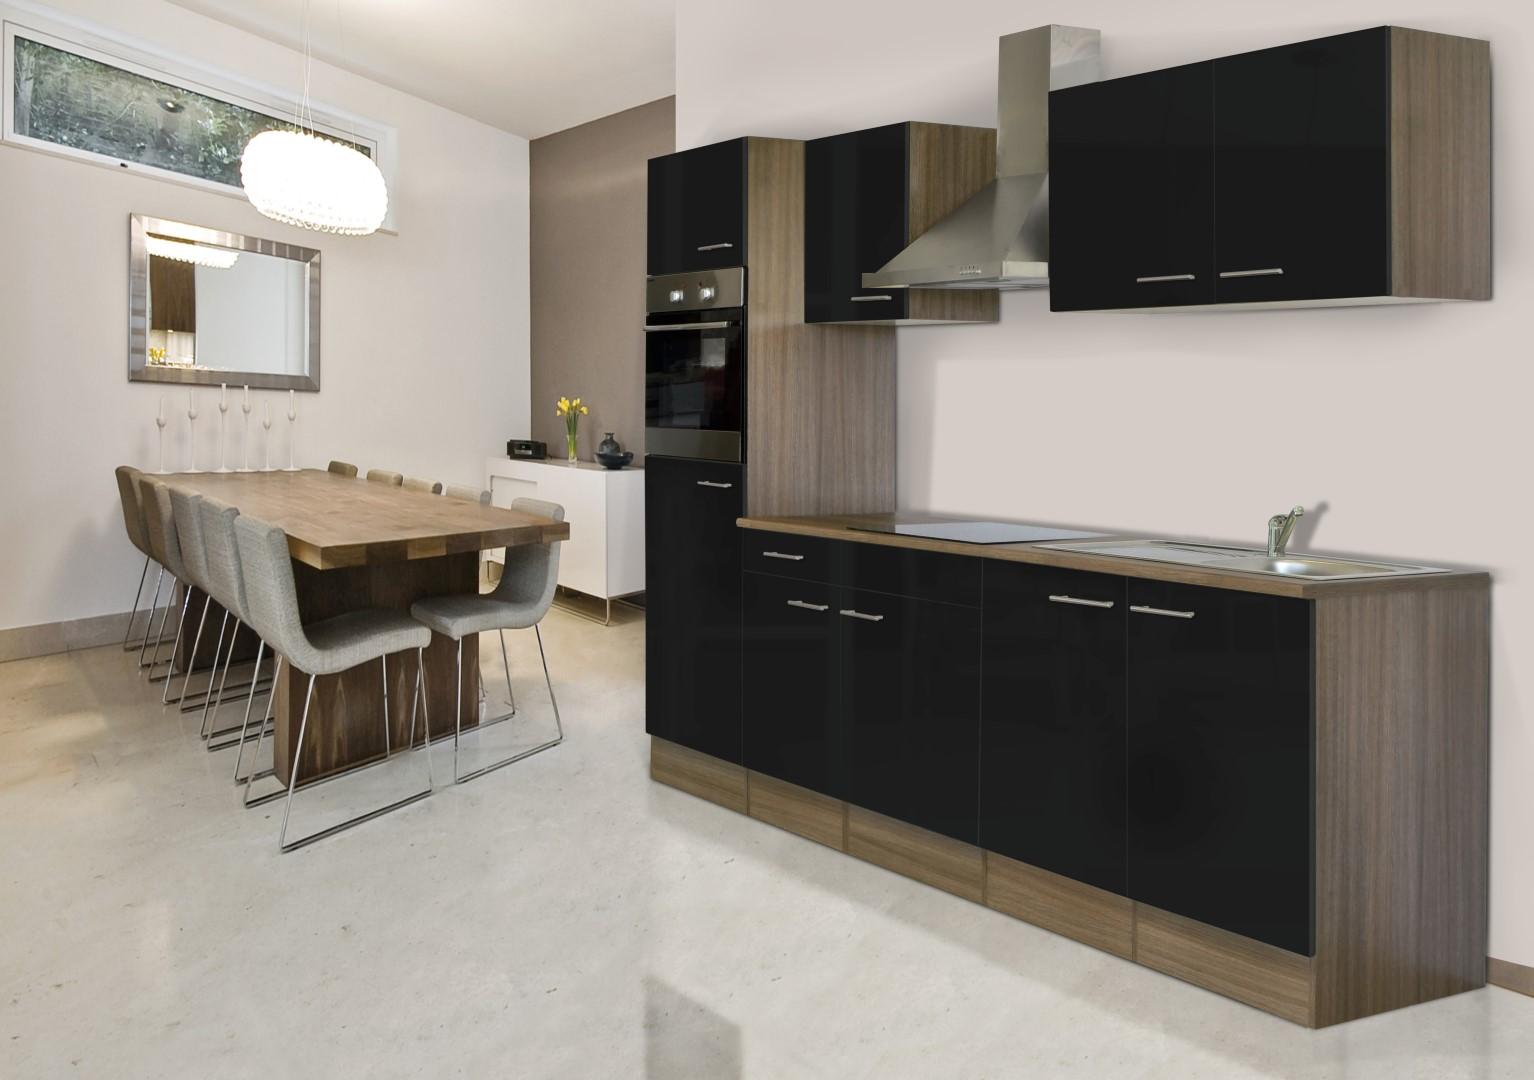 k chenzeile k che k chenblock einbauk che 270 cm eiche. Black Bedroom Furniture Sets. Home Design Ideas